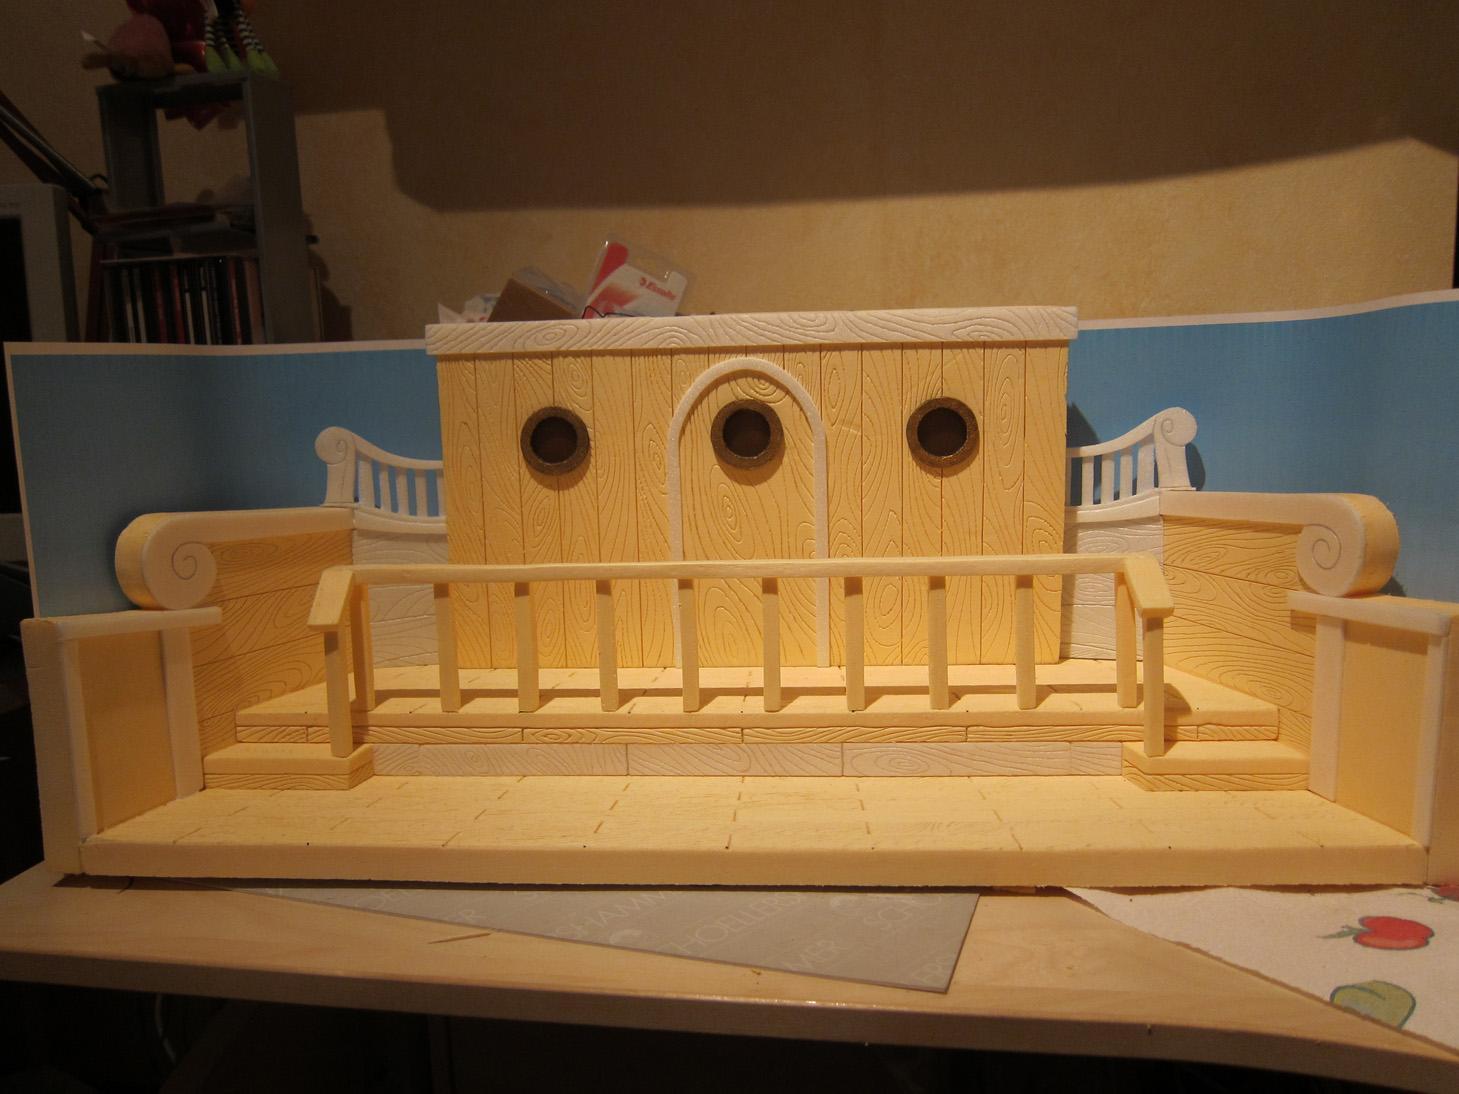 Fen tre sur diorama going merry par dario noli for Separation decorative entre 2 pieces